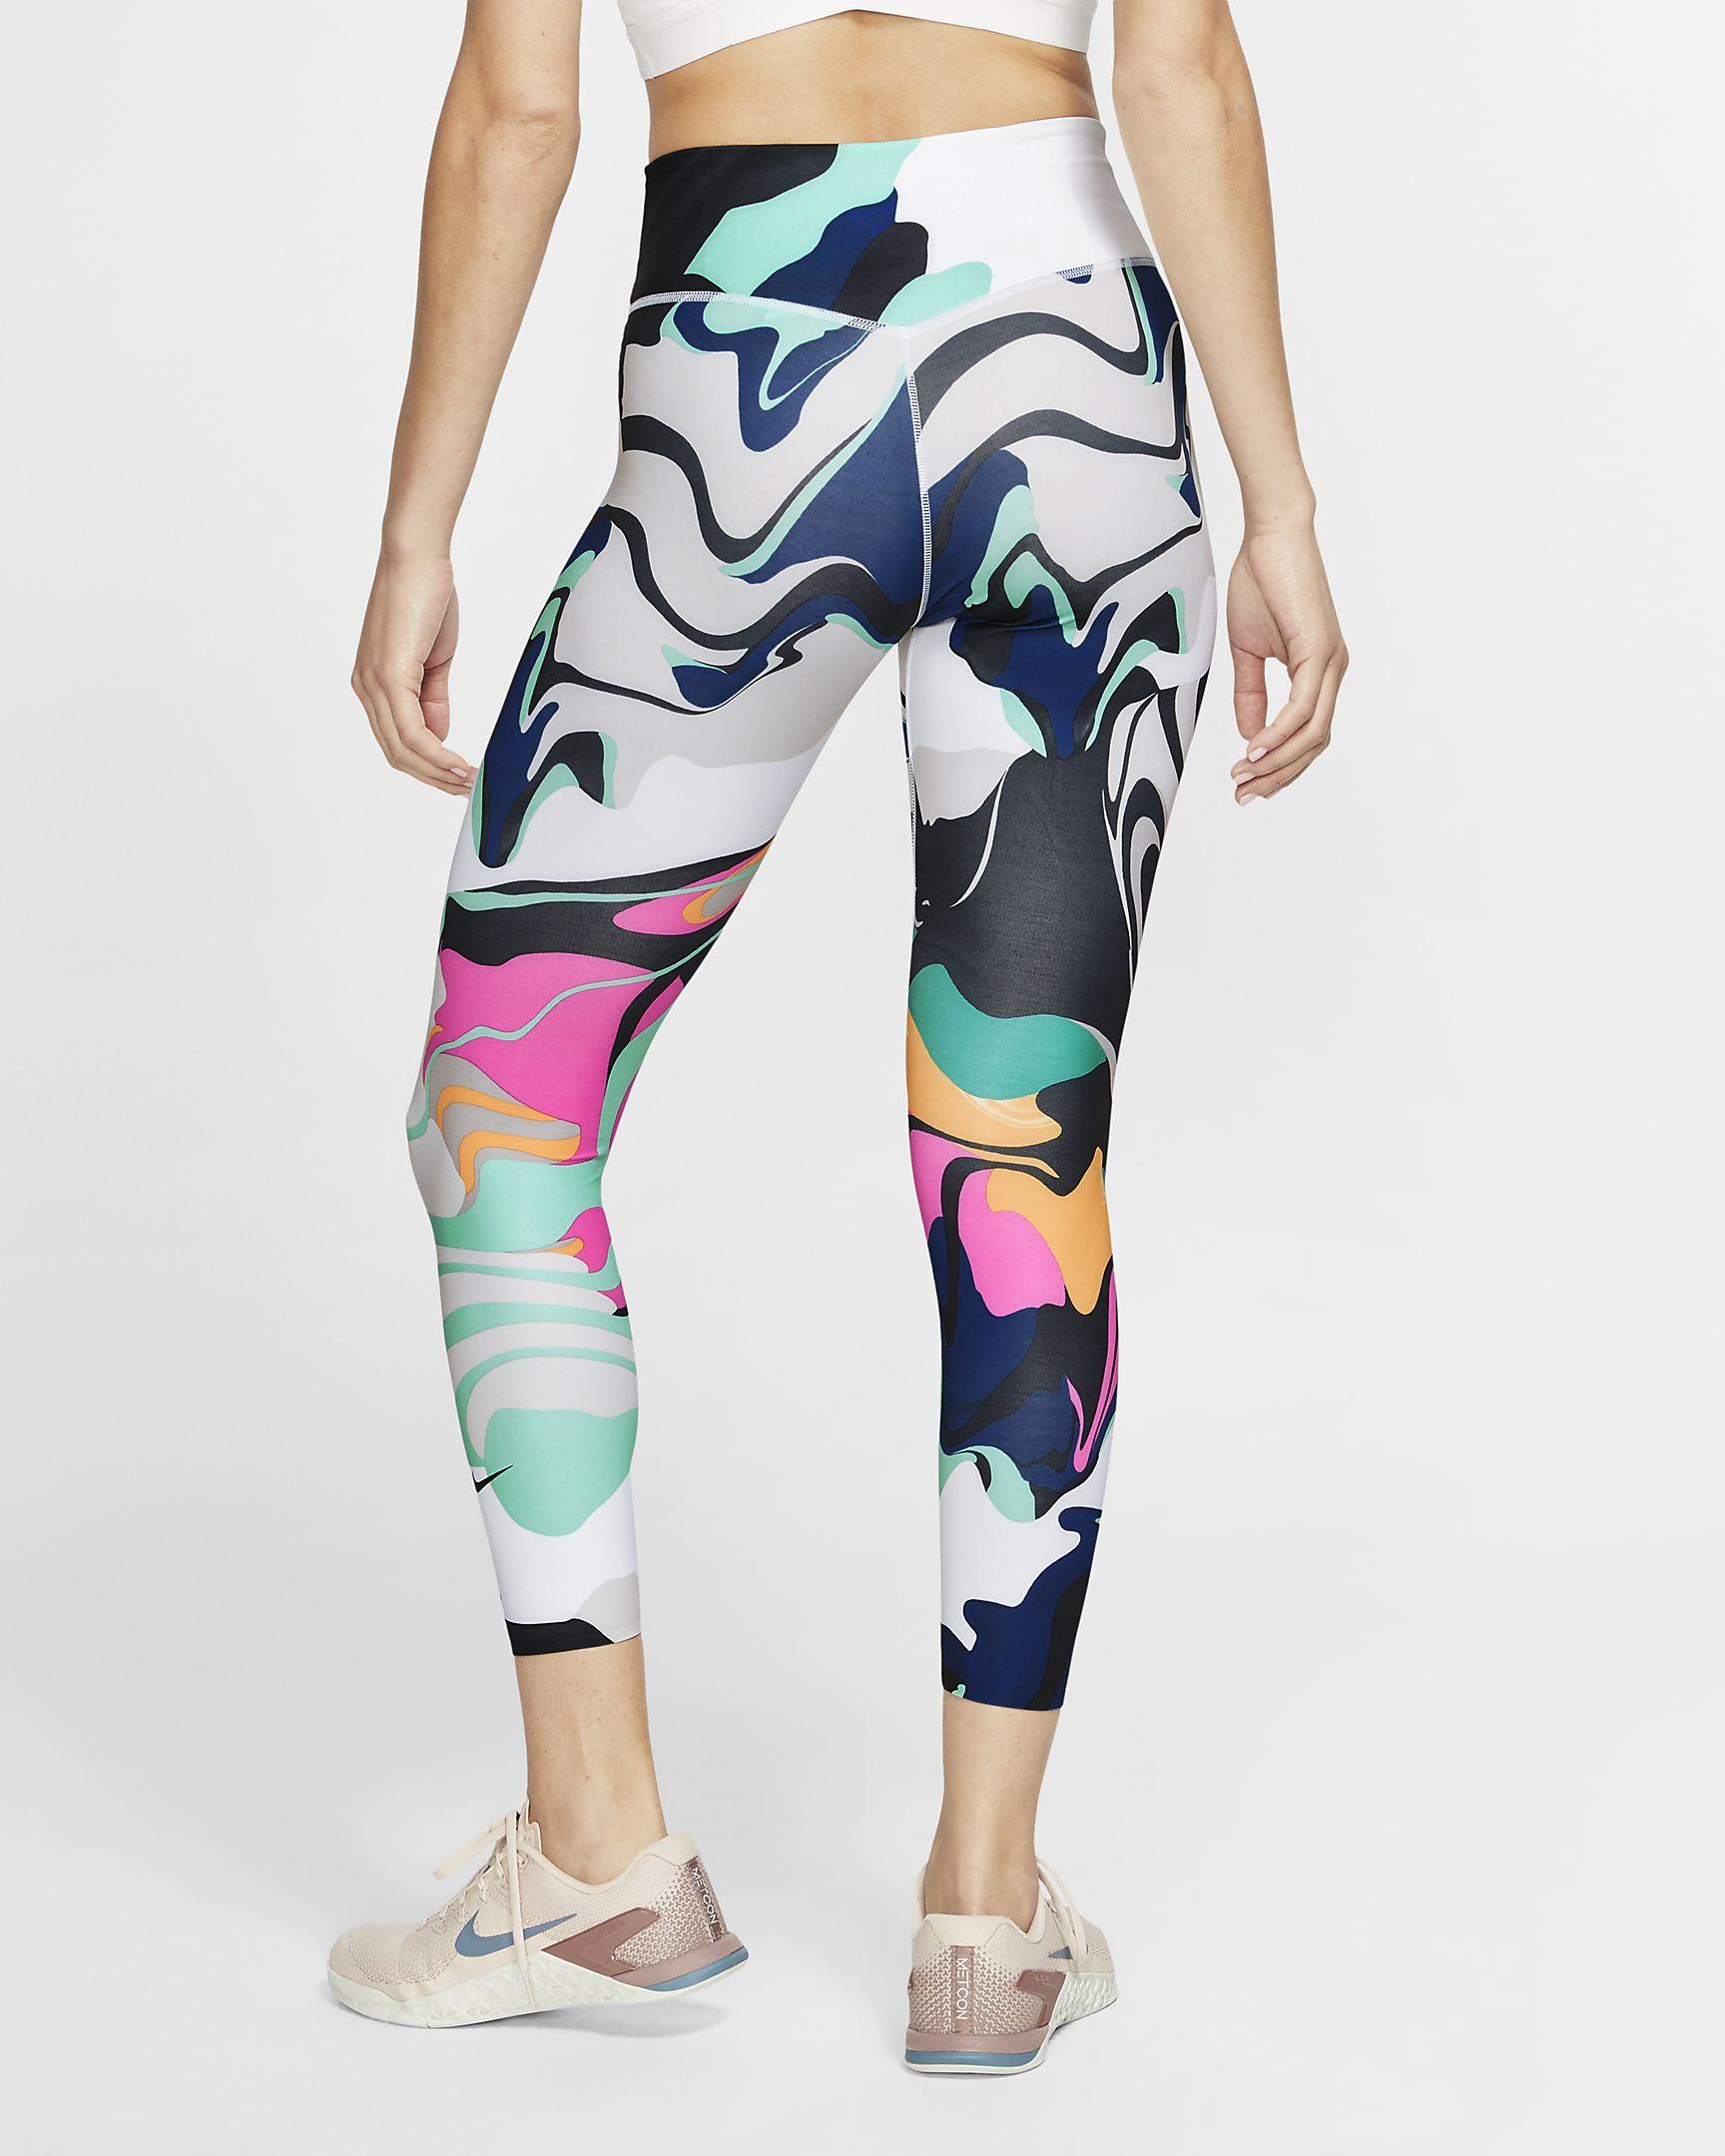 one-womens-7-8-tights-WSS6mg-1.jpg